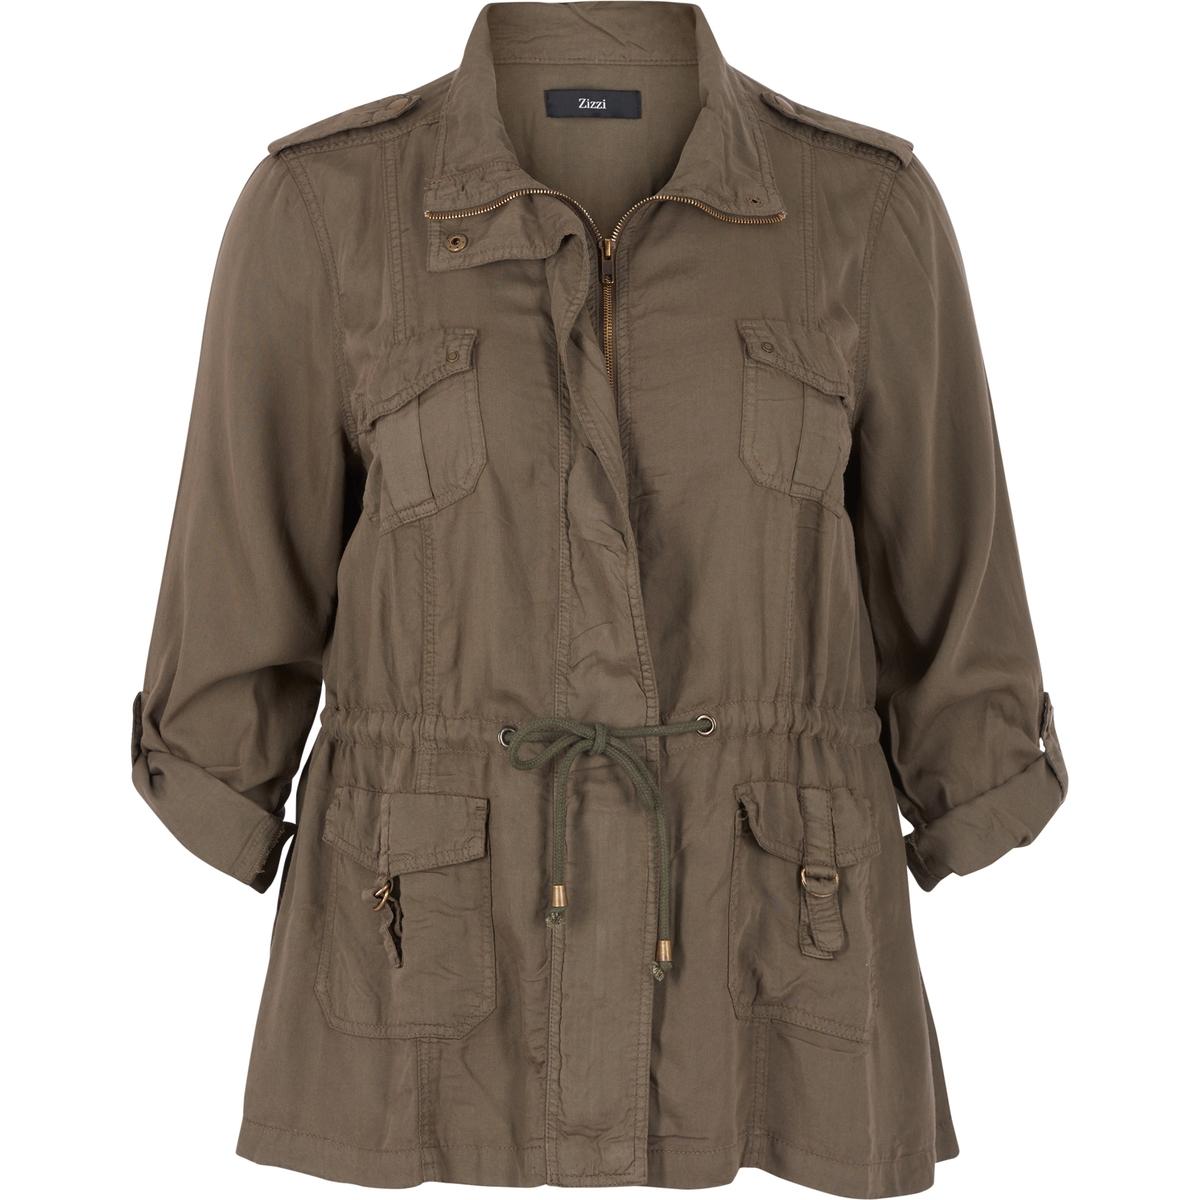 Куртка в стиле милитари<br><br>Цвет: хаки<br>Размер: 46/48 (FR) - 52/54 (RUS)